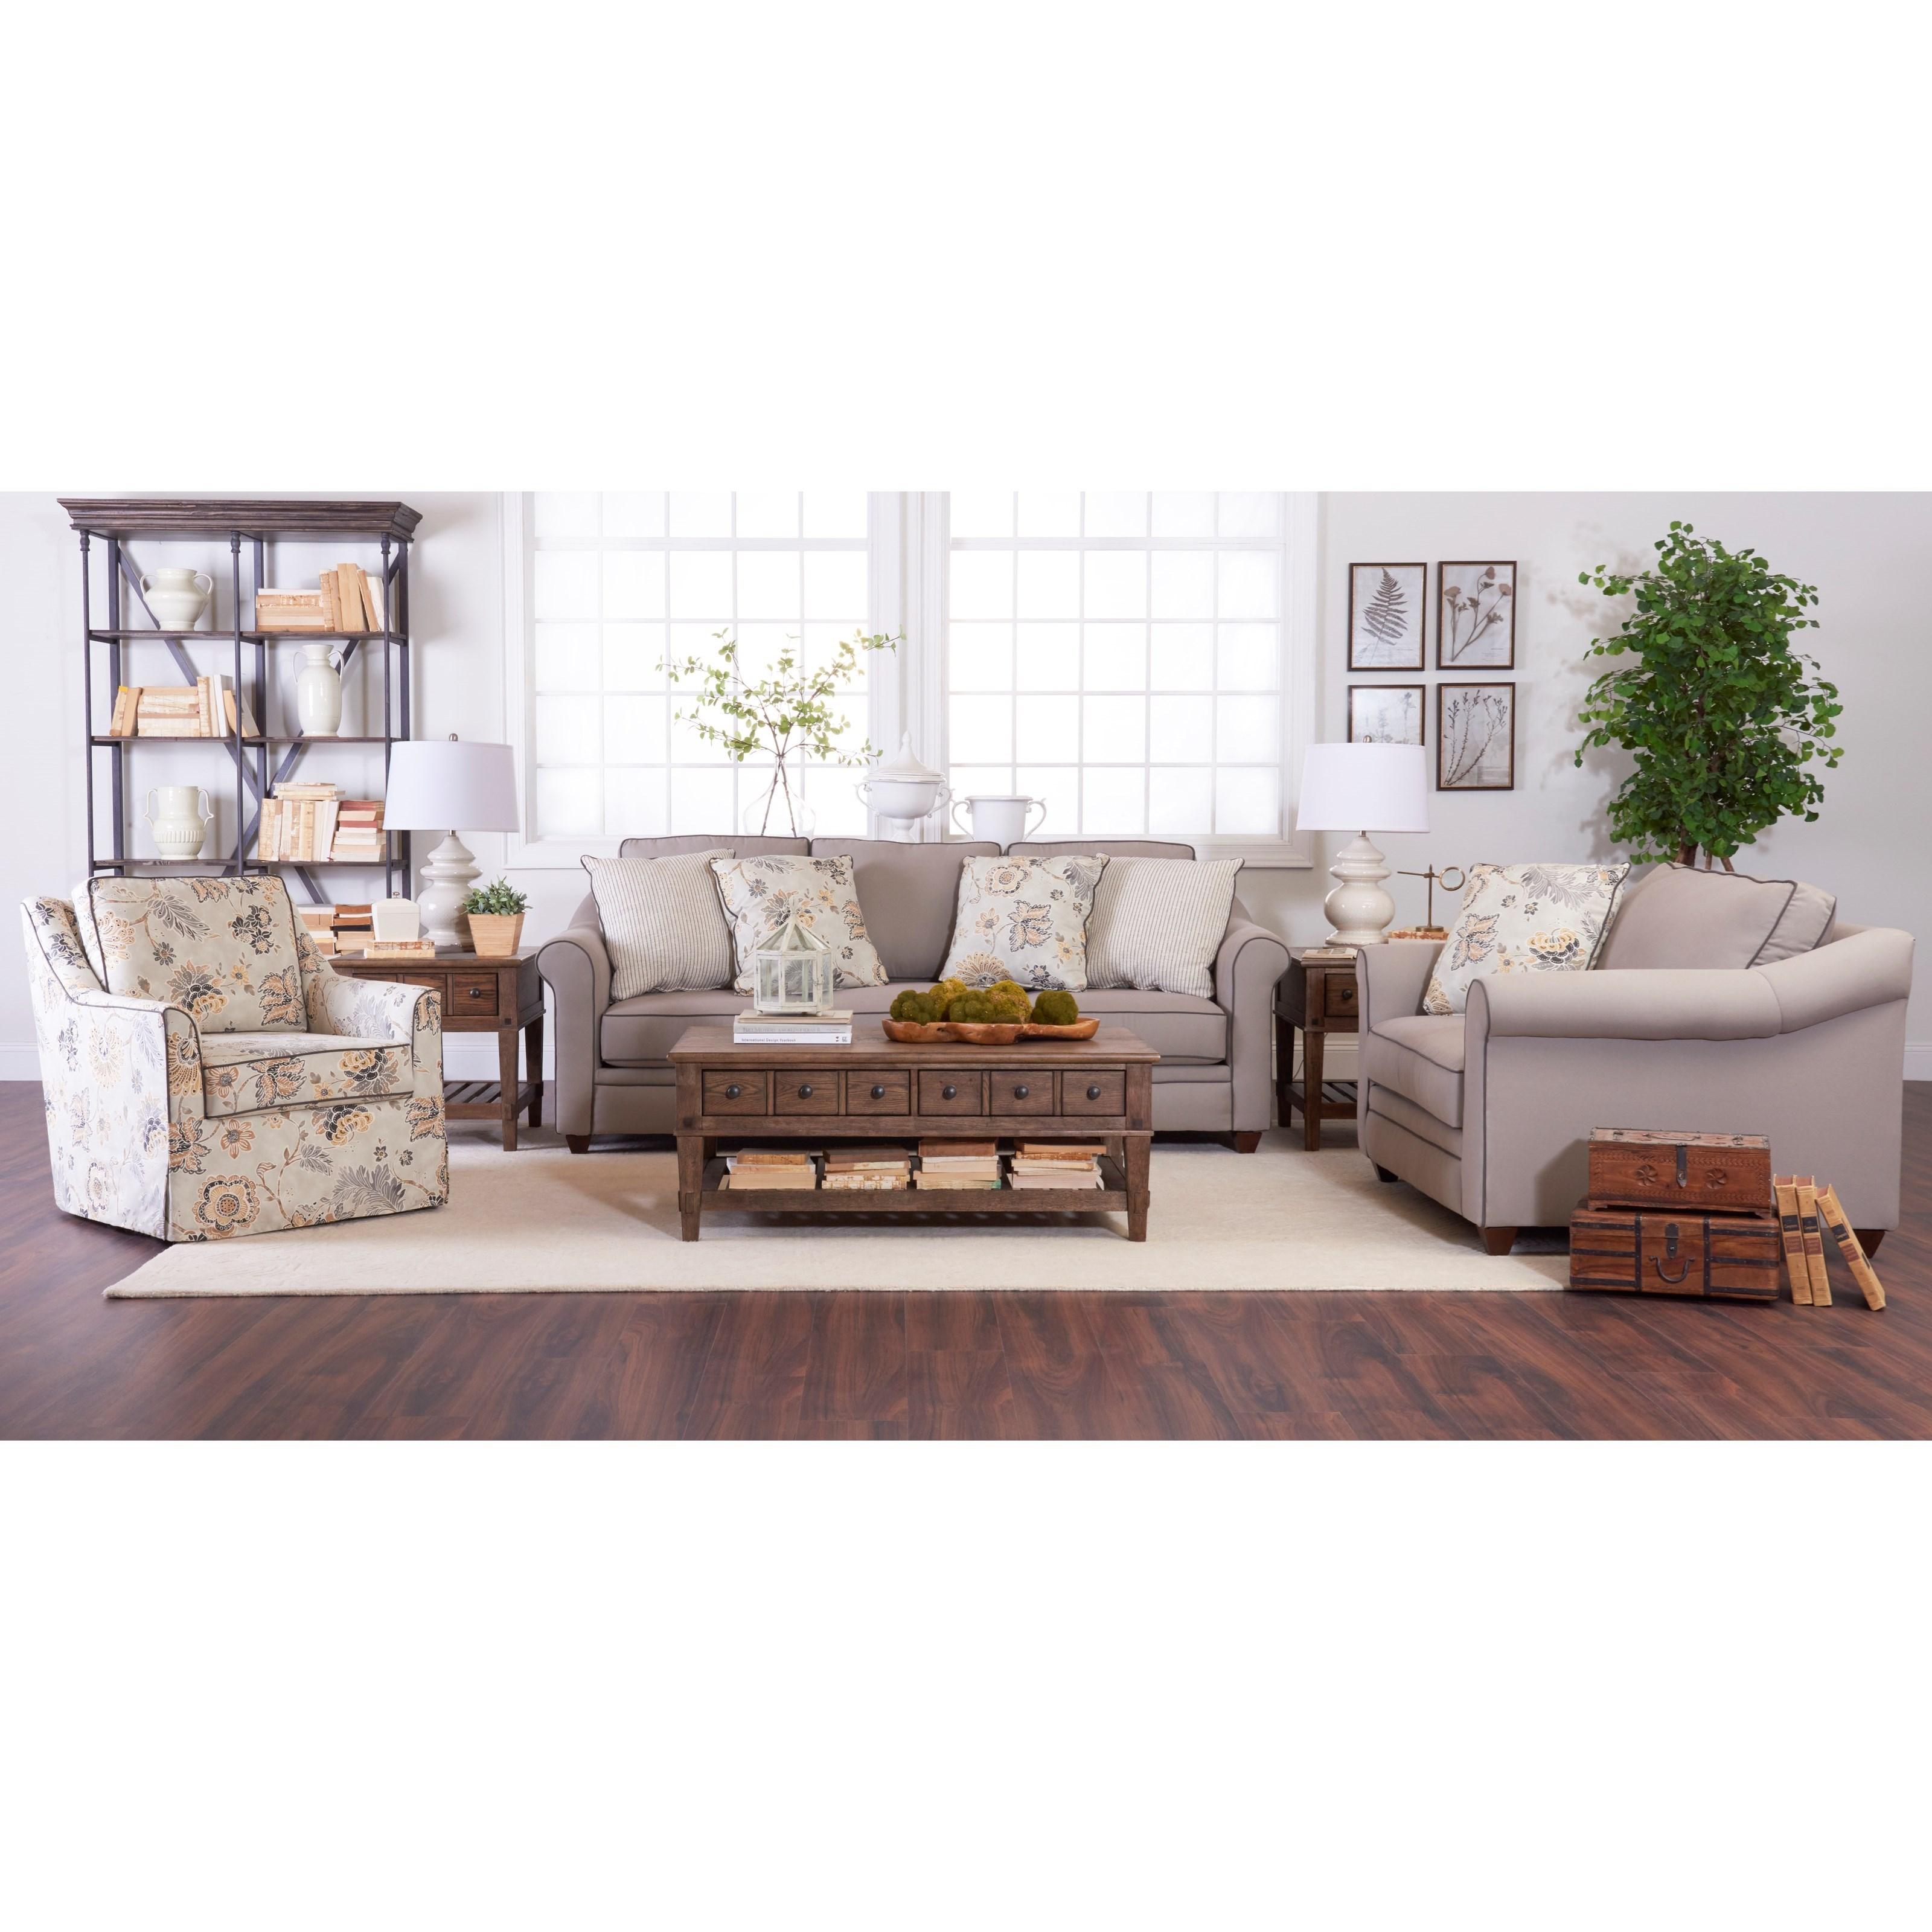 Klaussner Sandy Ridge Living Room Group Suburban Furniture Stationary Living Room Groups